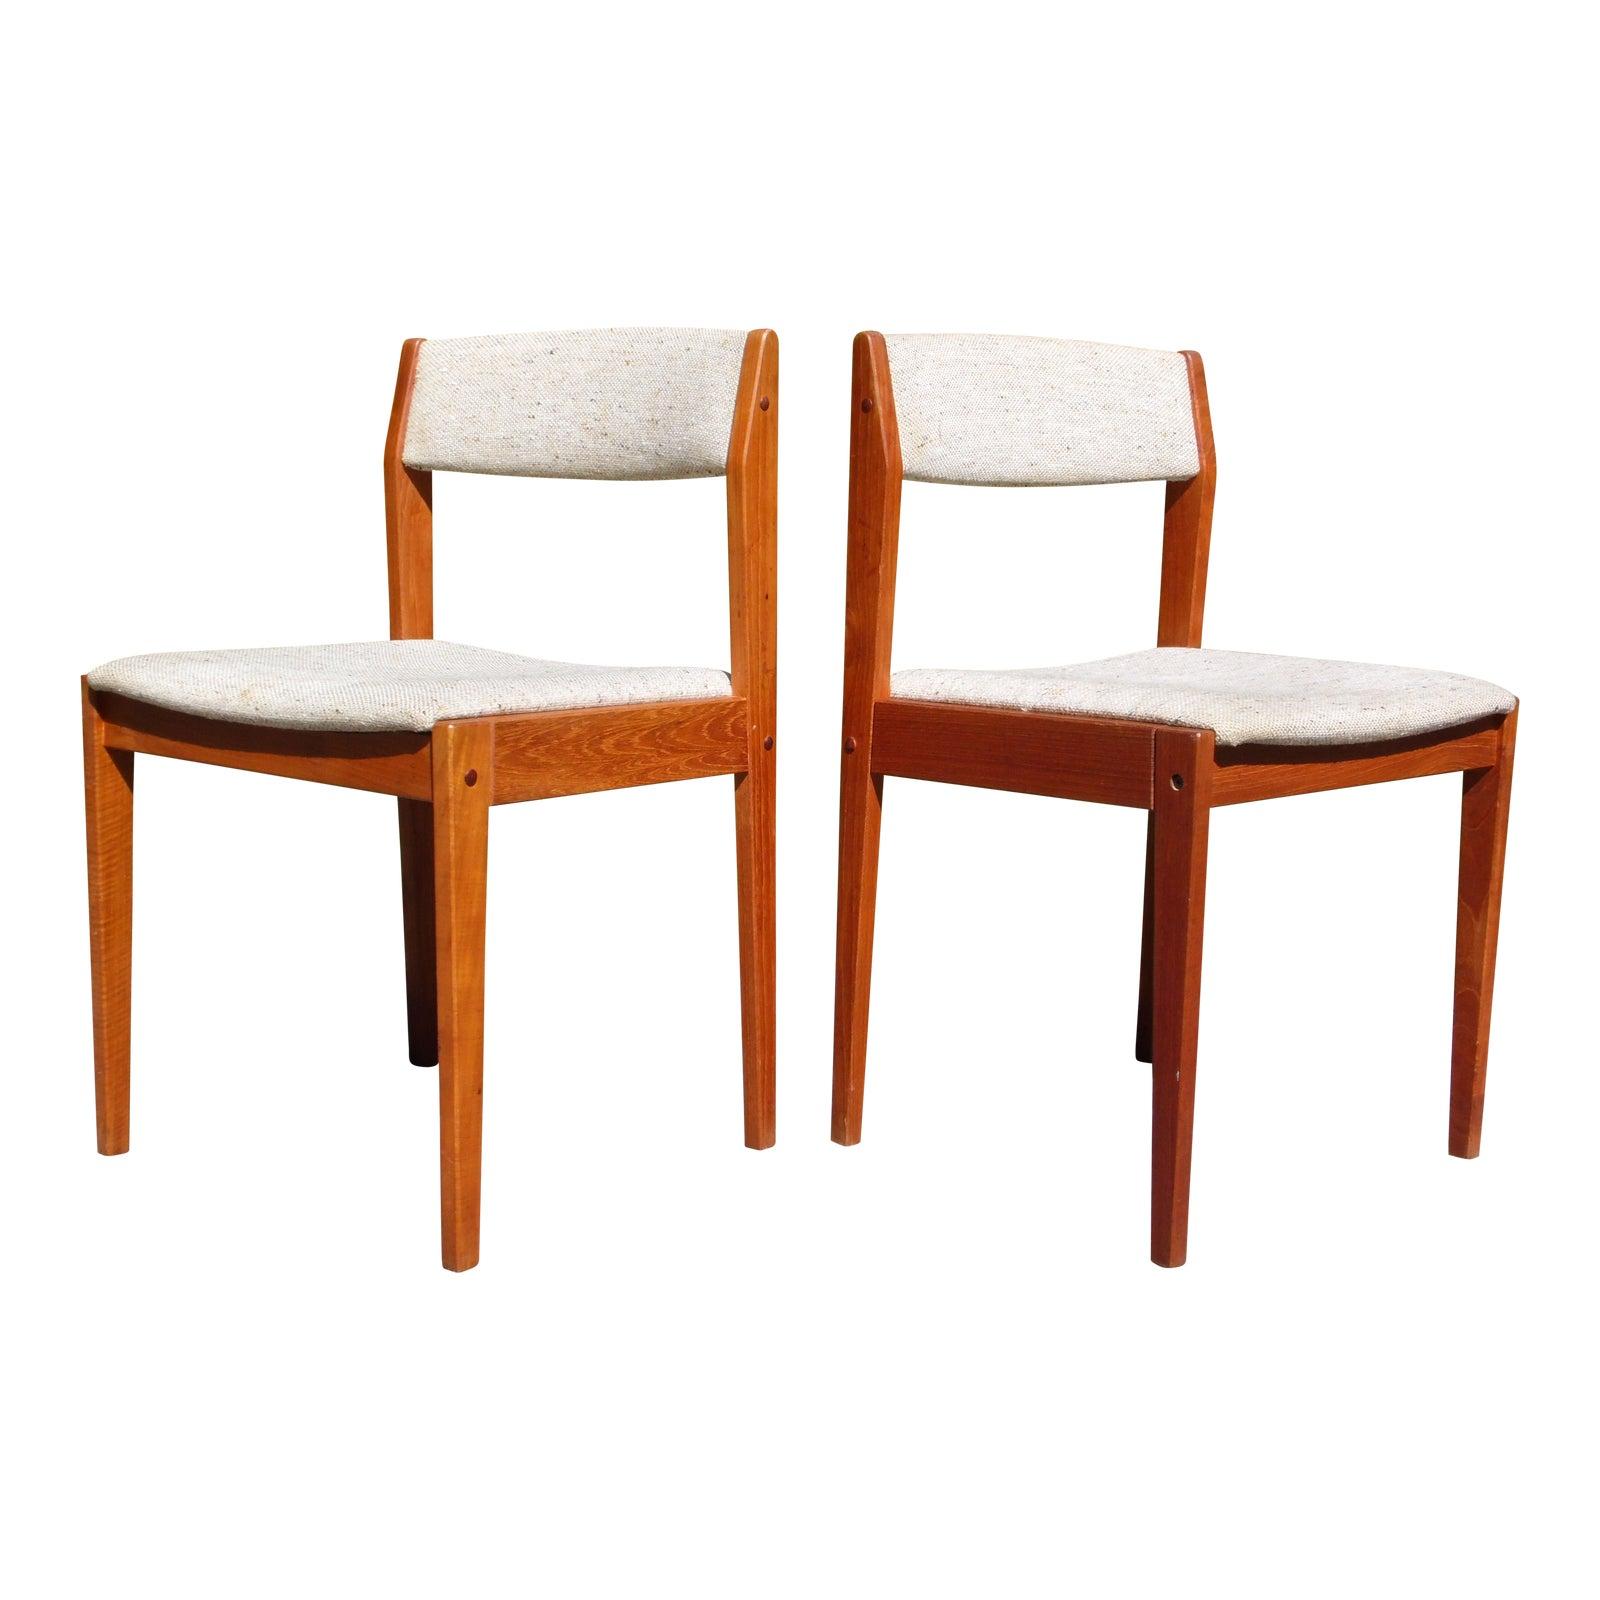 Vintage Pair Danish Modern Teak Dining Chairs Tarm Stole Denmark